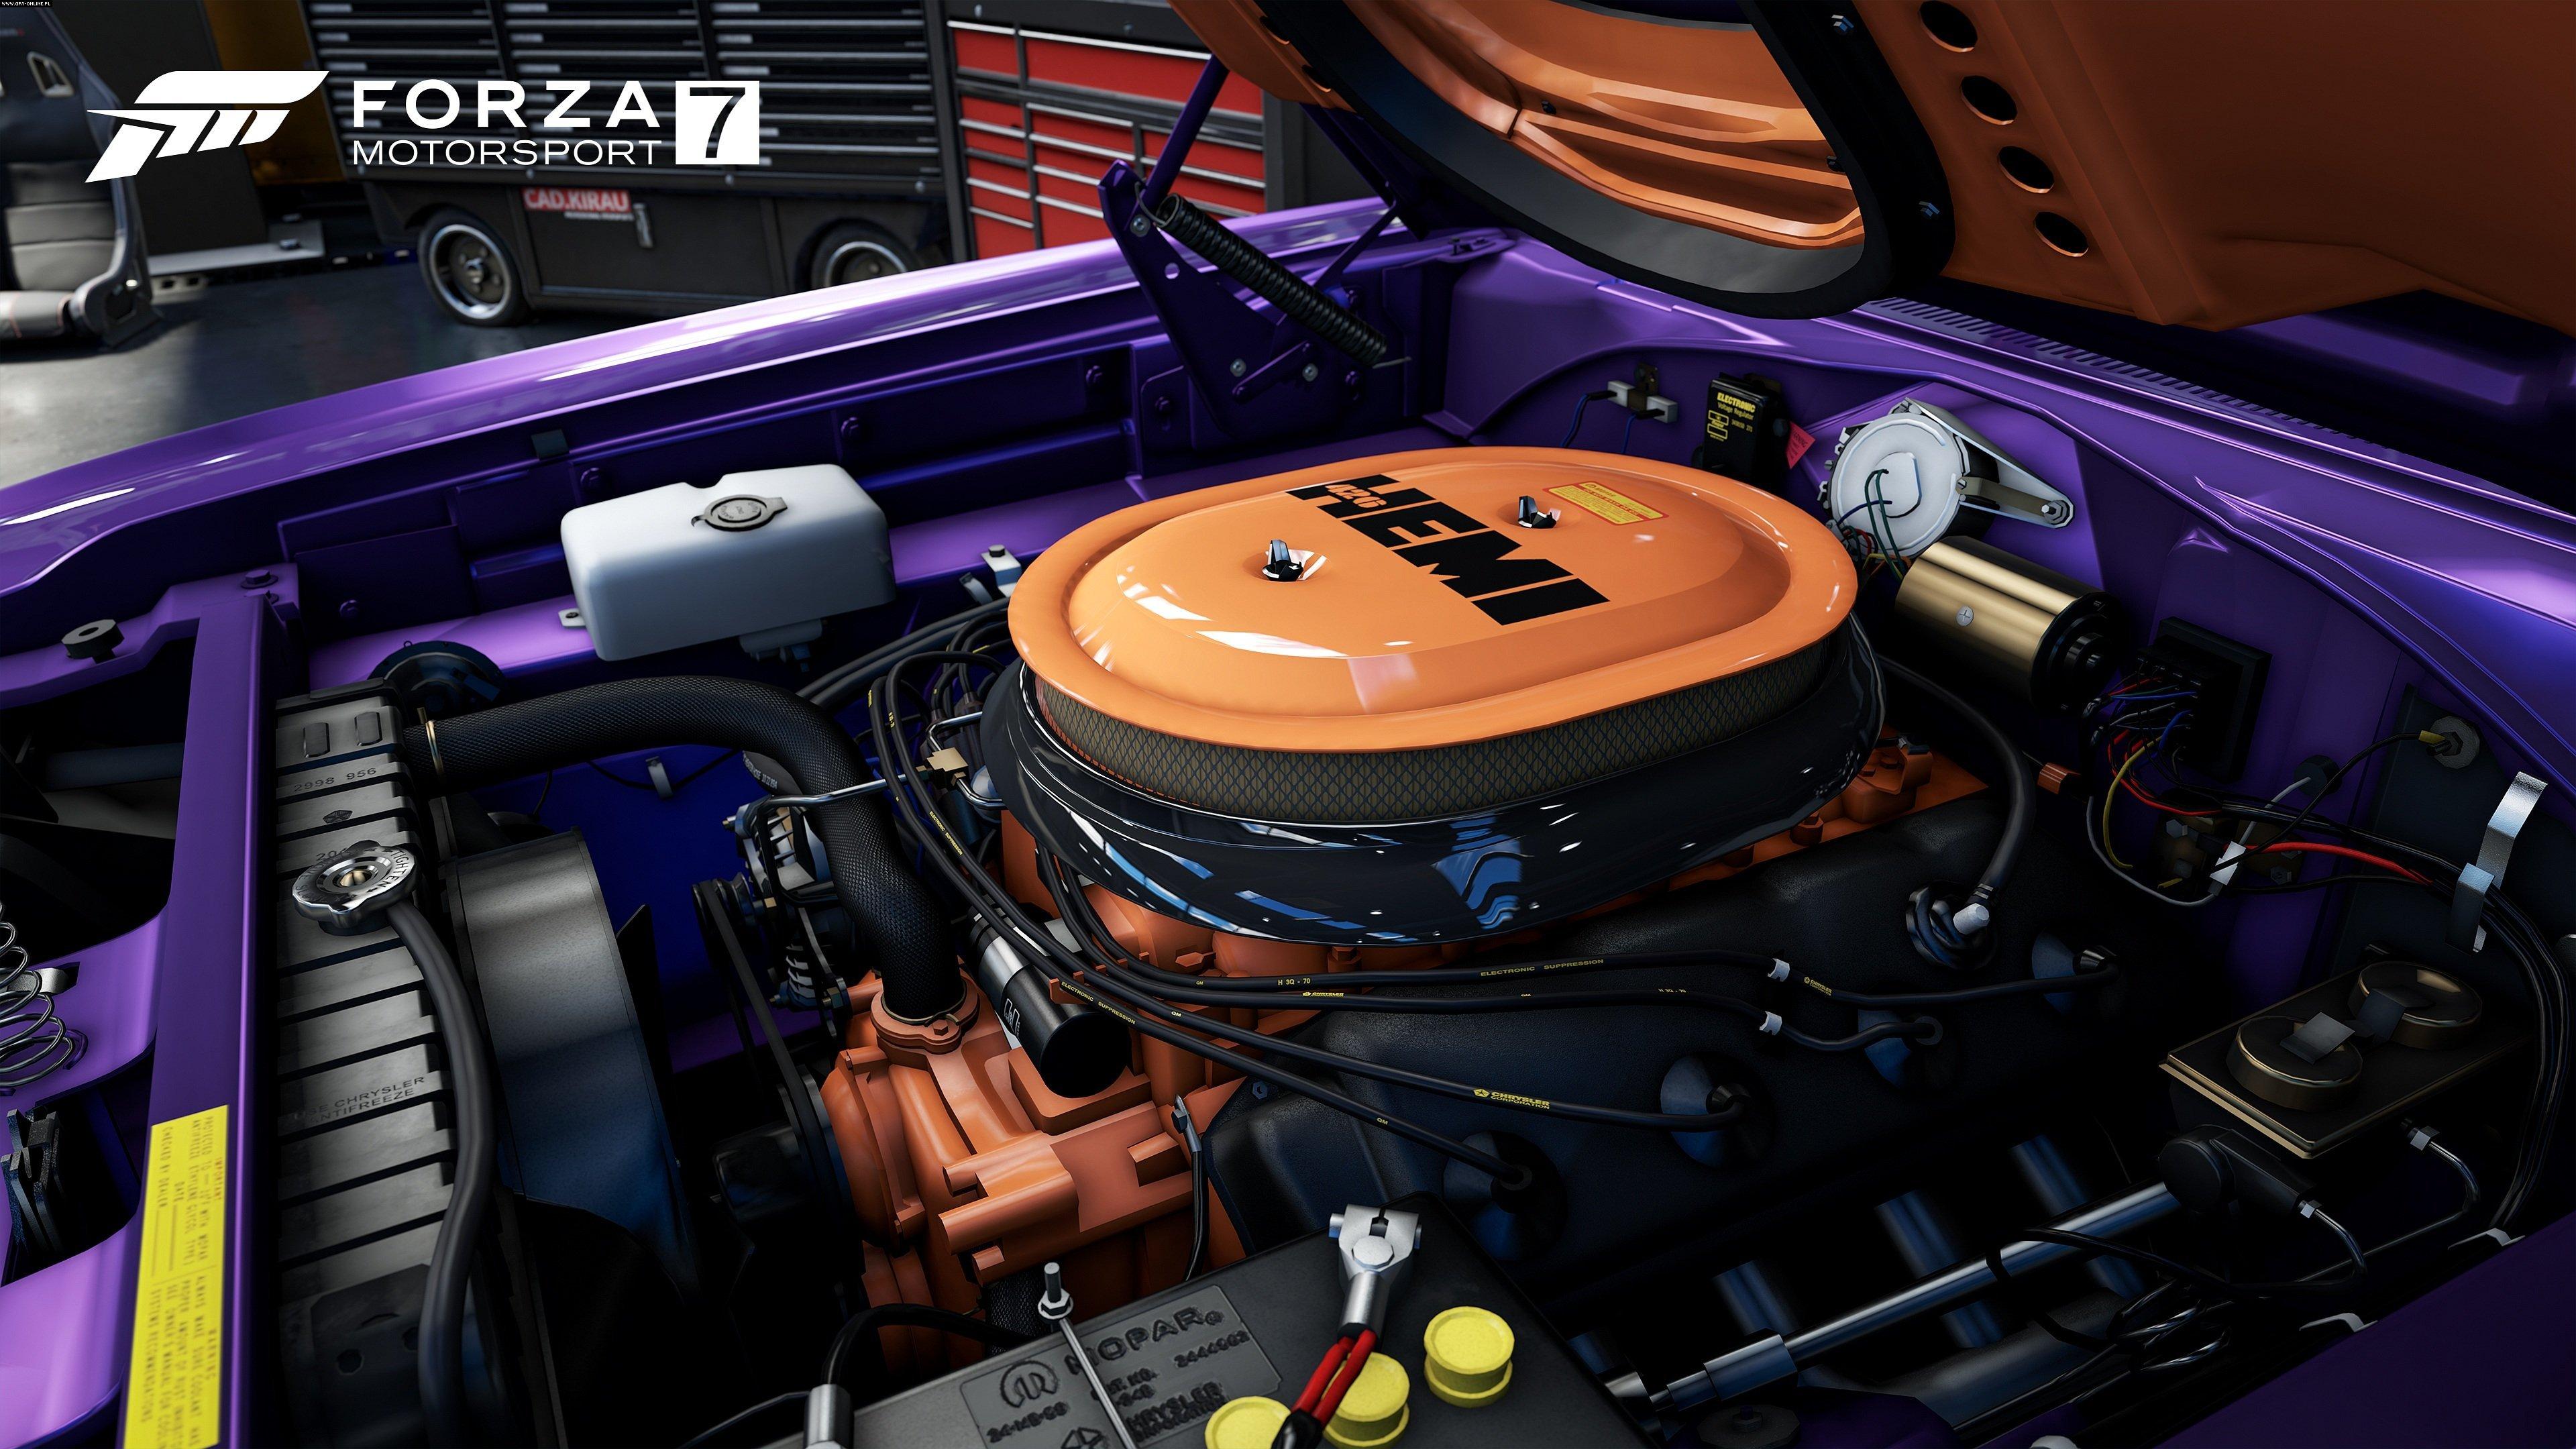 Forza Motorsport 7 XONE, PC Games Image 6/8, Turn 10 Studios, Microsoft Studios